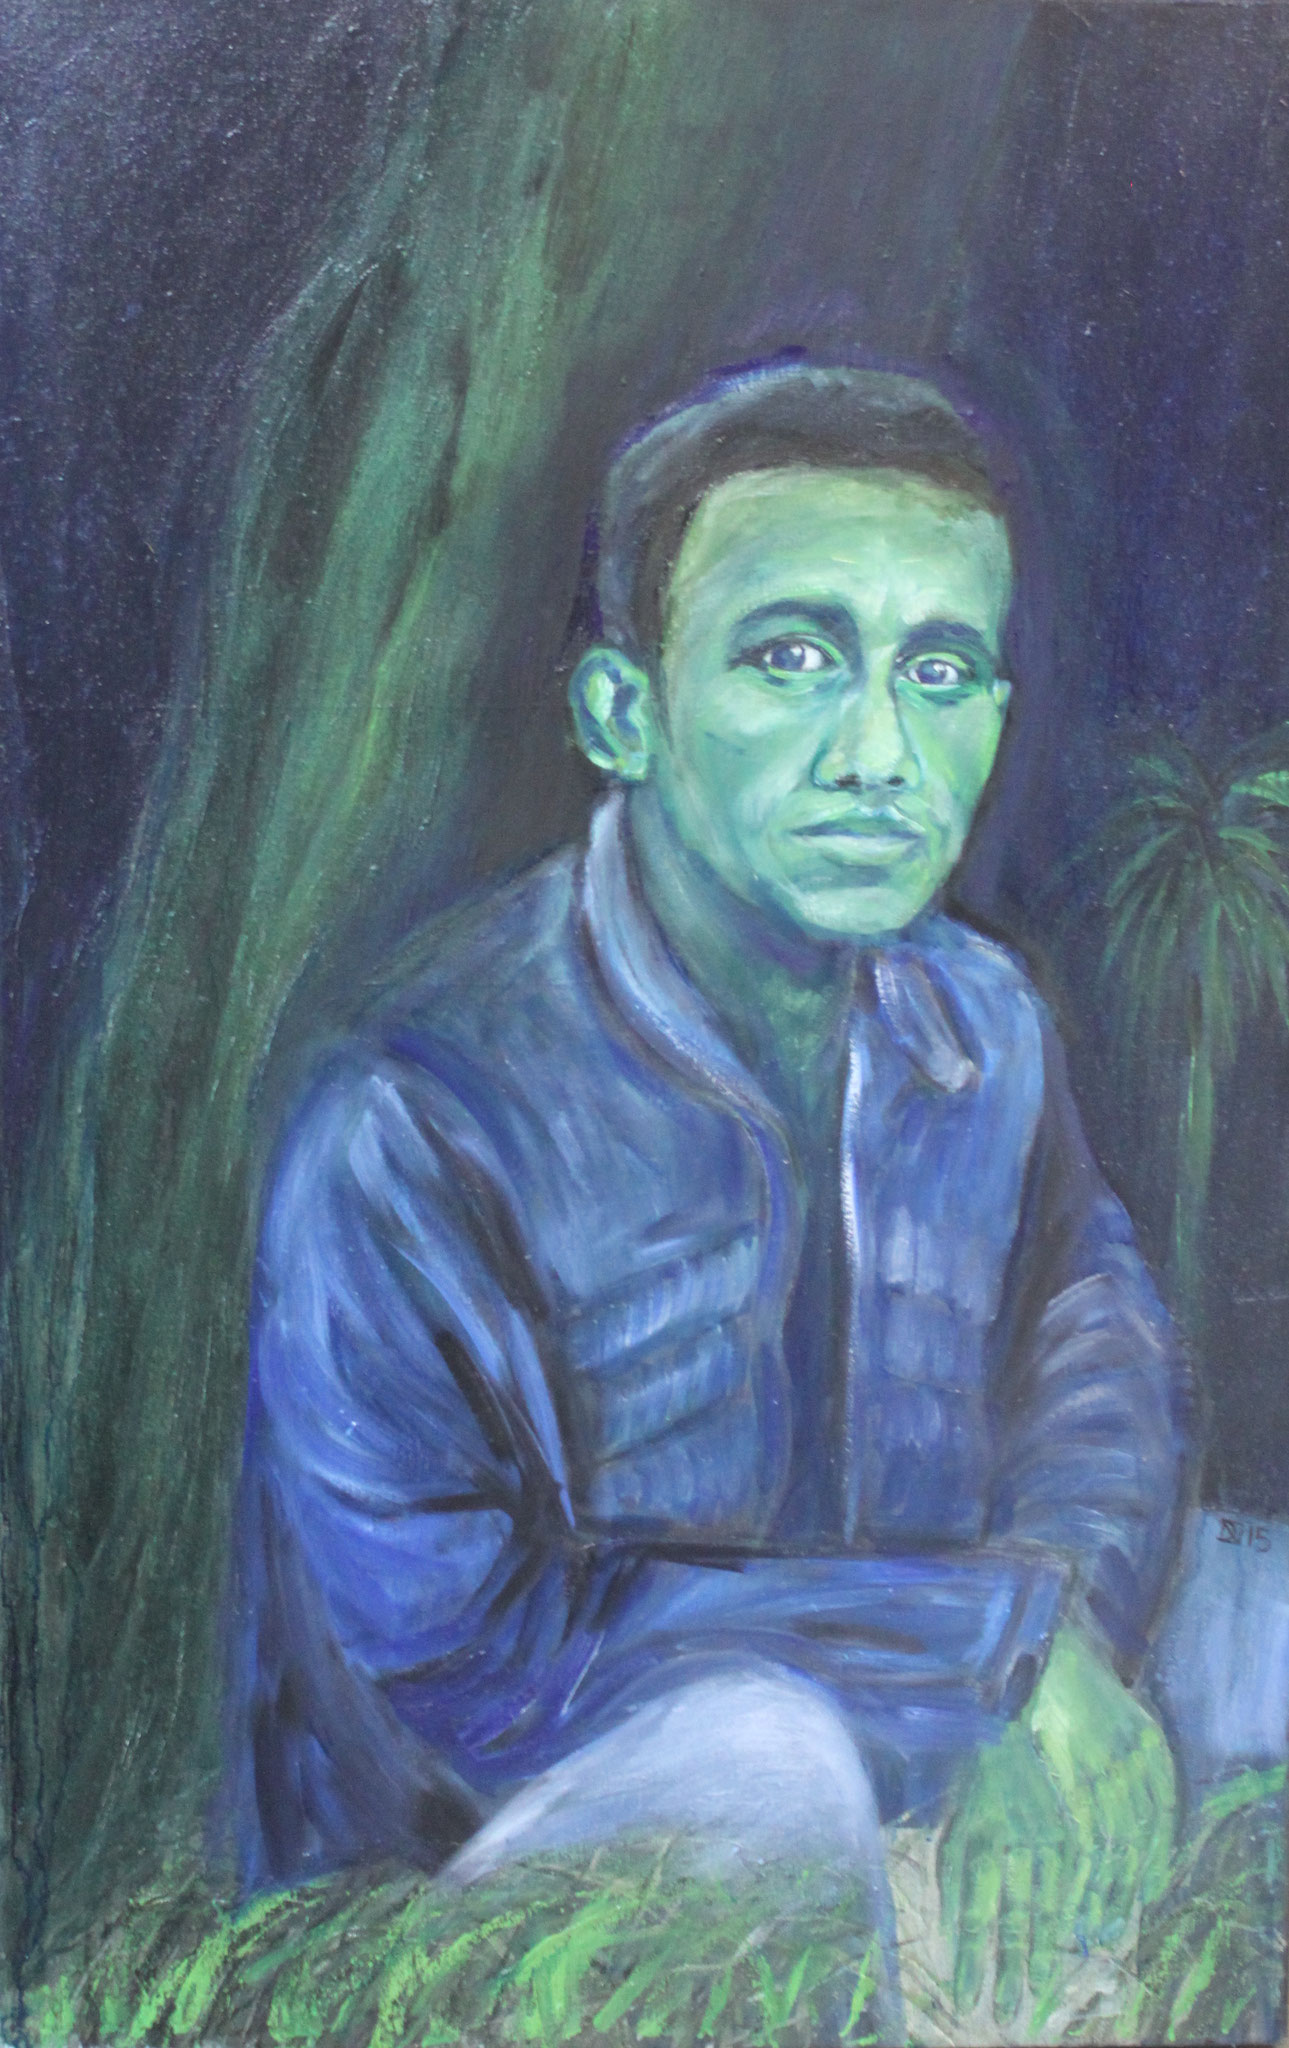 Kamal, Öl auf Leinwand, 110 cm x 70 cm, 2015